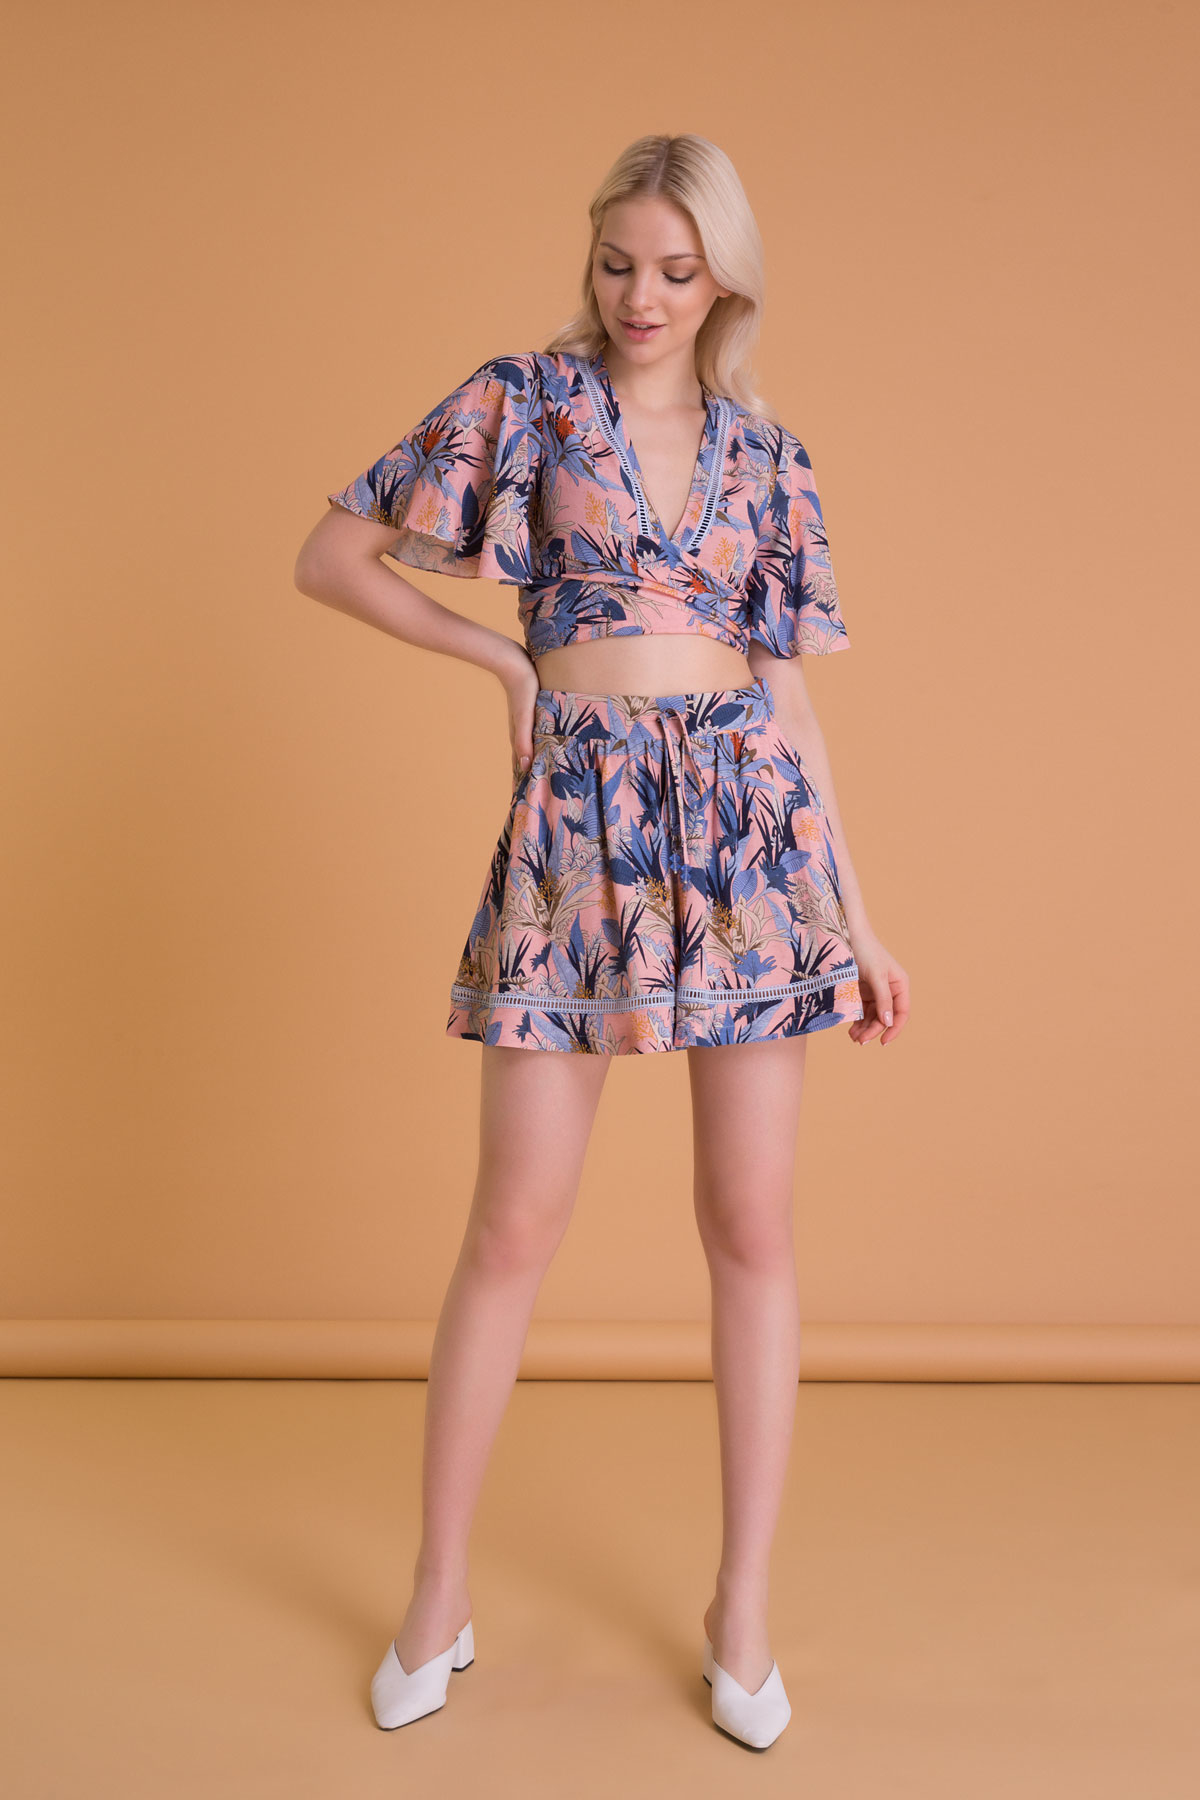 Tropical Patterned High Waist Mini Shorts